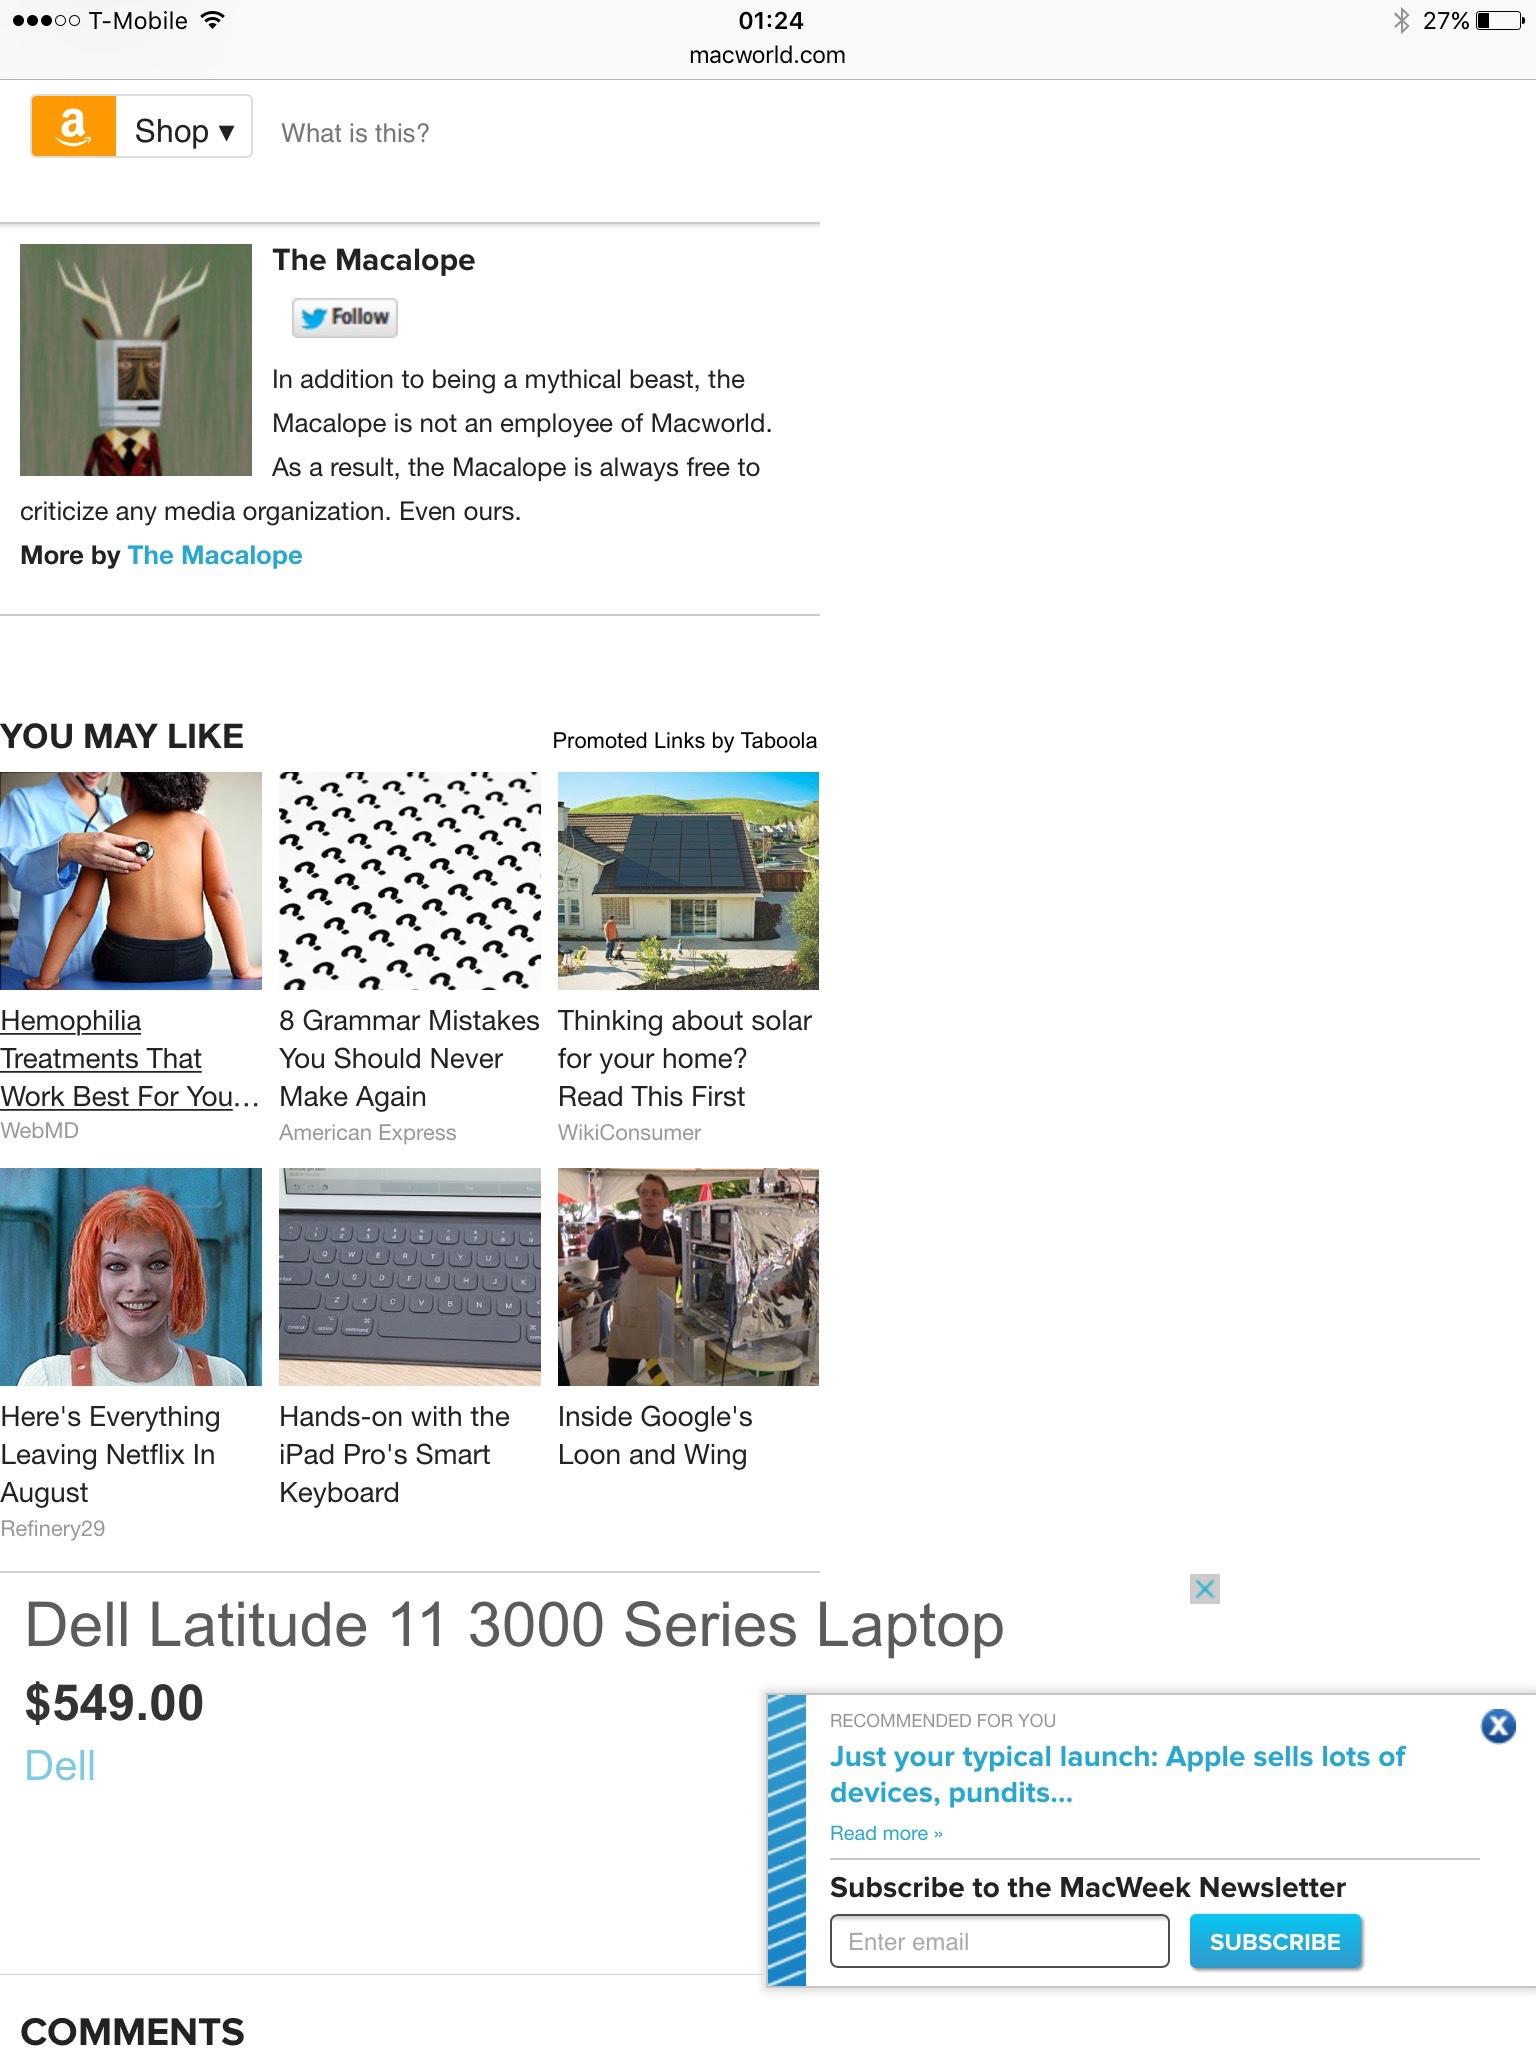 Macworld Ad-infested